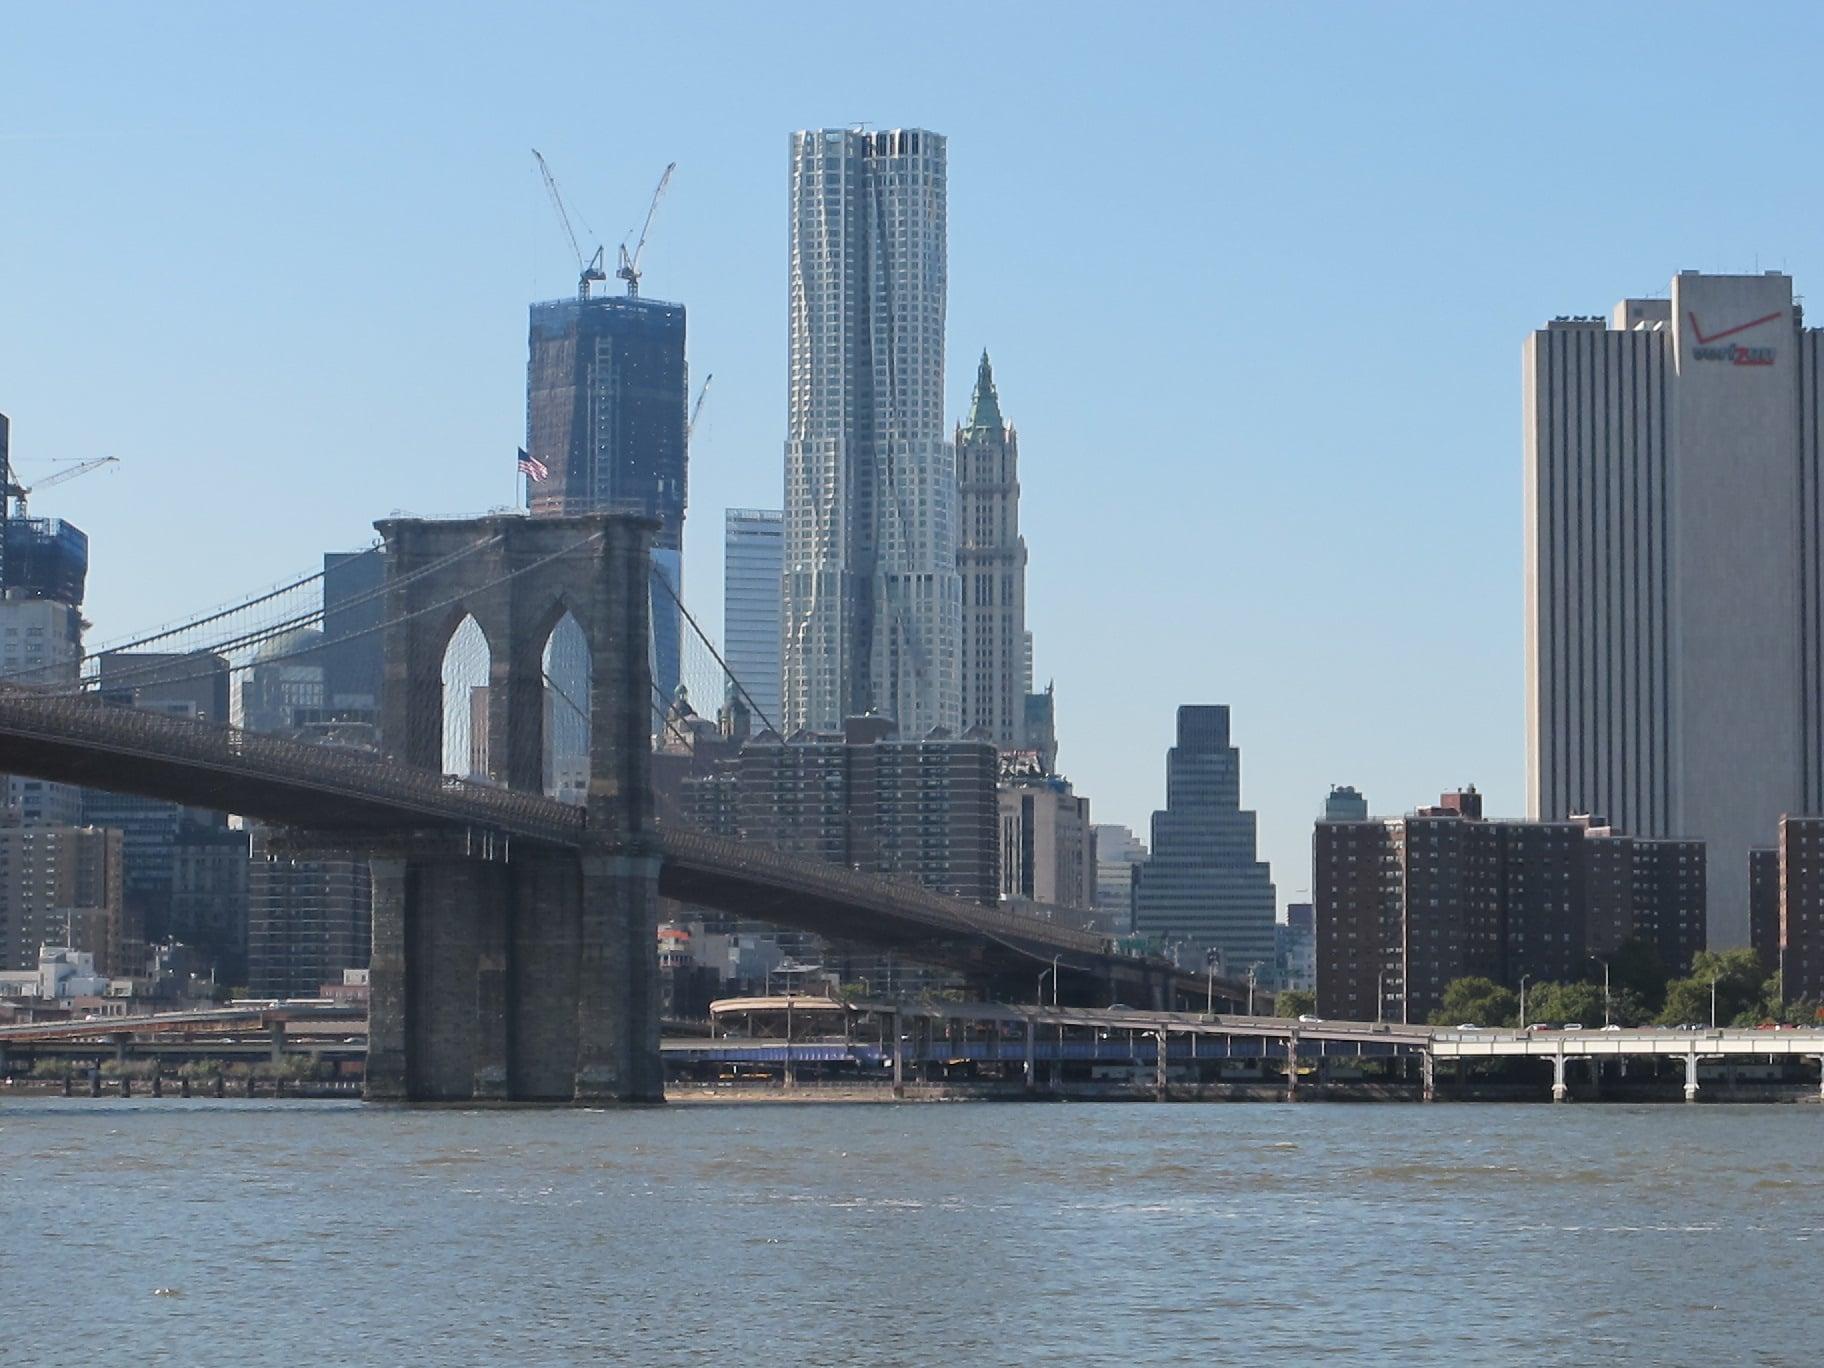 The Brooklyn Bridge operates since 1883. Photo: Bruny Nieves